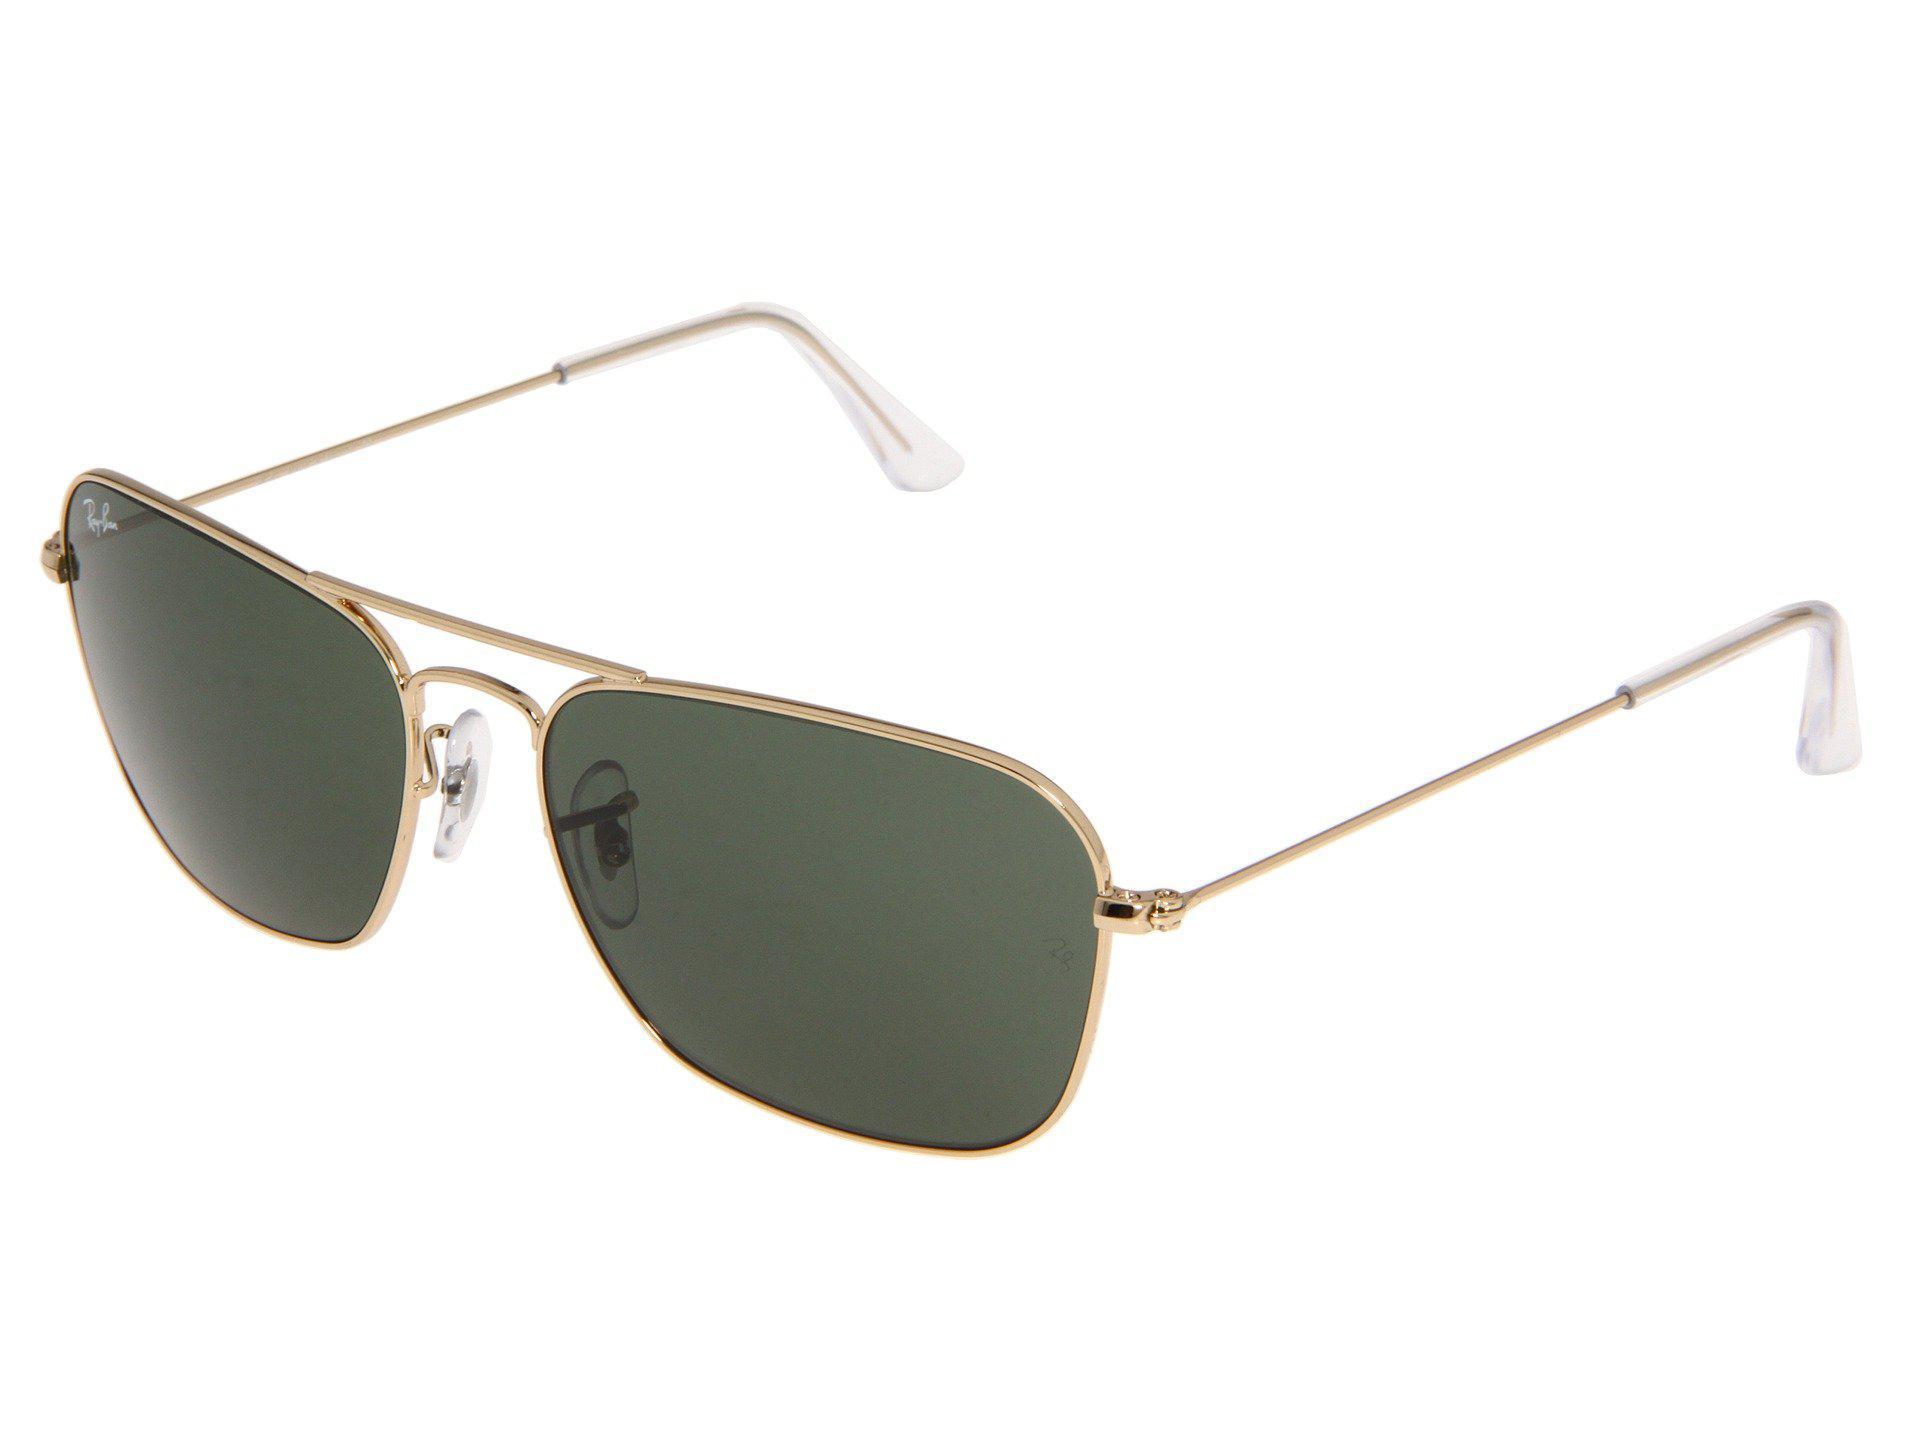 ec3ce4dd65d Ray-Ban. Women s Green Rb3136 Caravan Size 58mm (arista g-15xlt Lens) Sport  Sunglasses